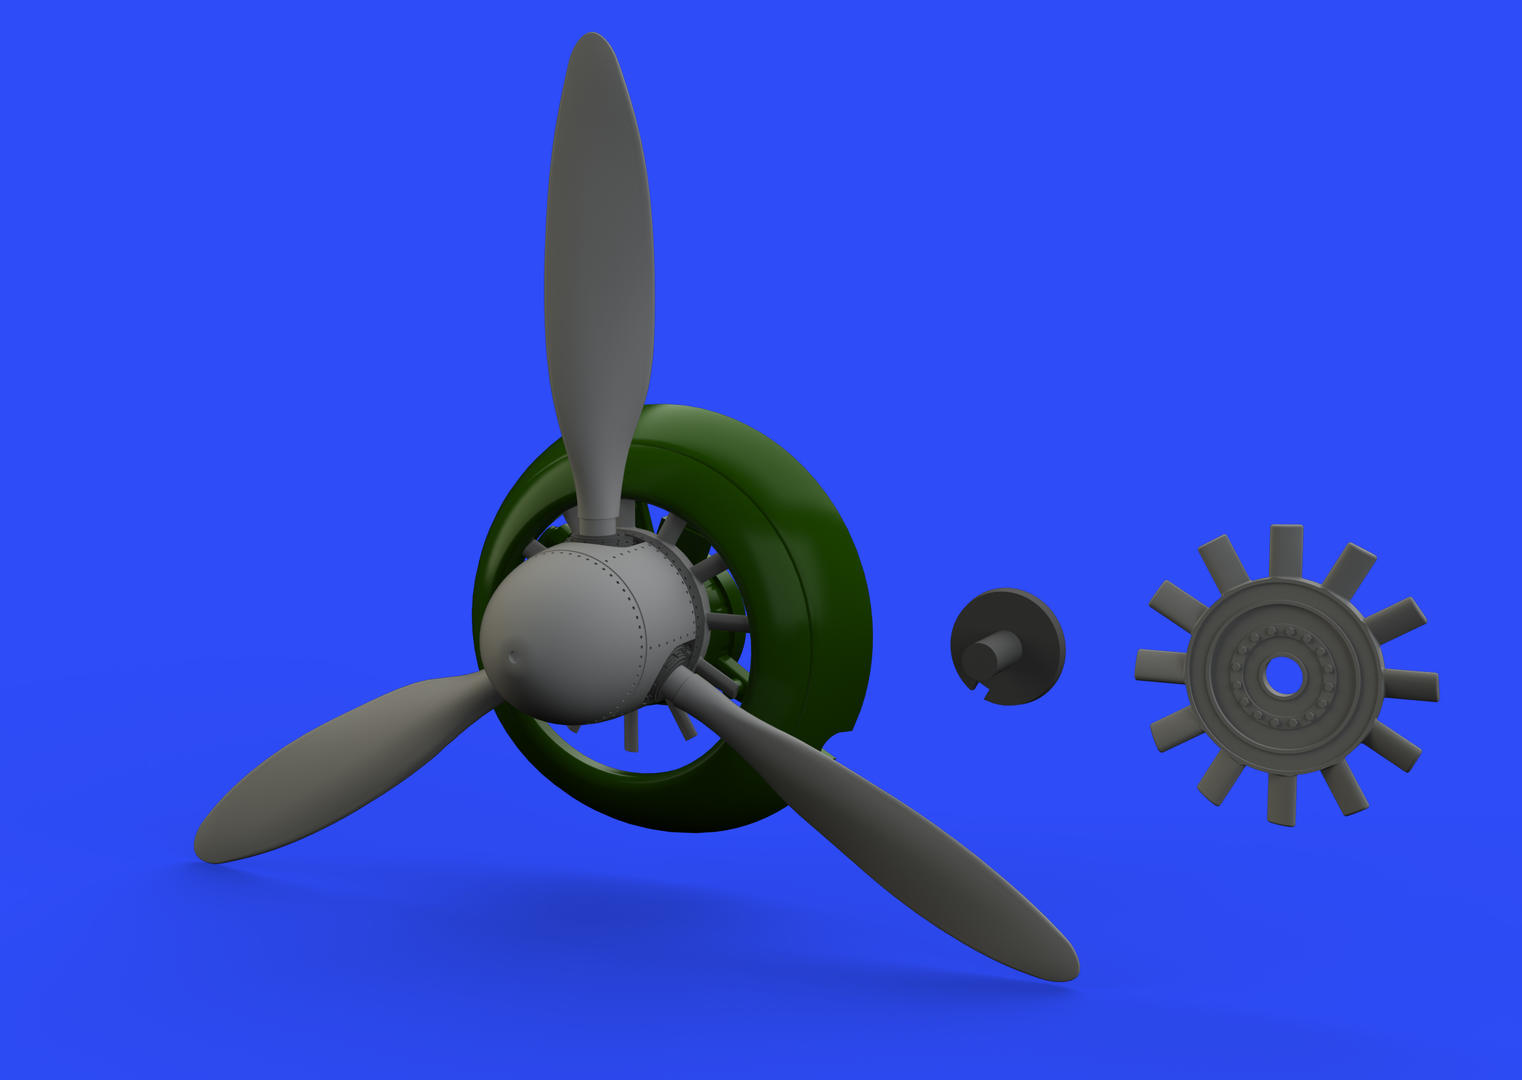 1/48 Fw 190A propeller (EDUARD)